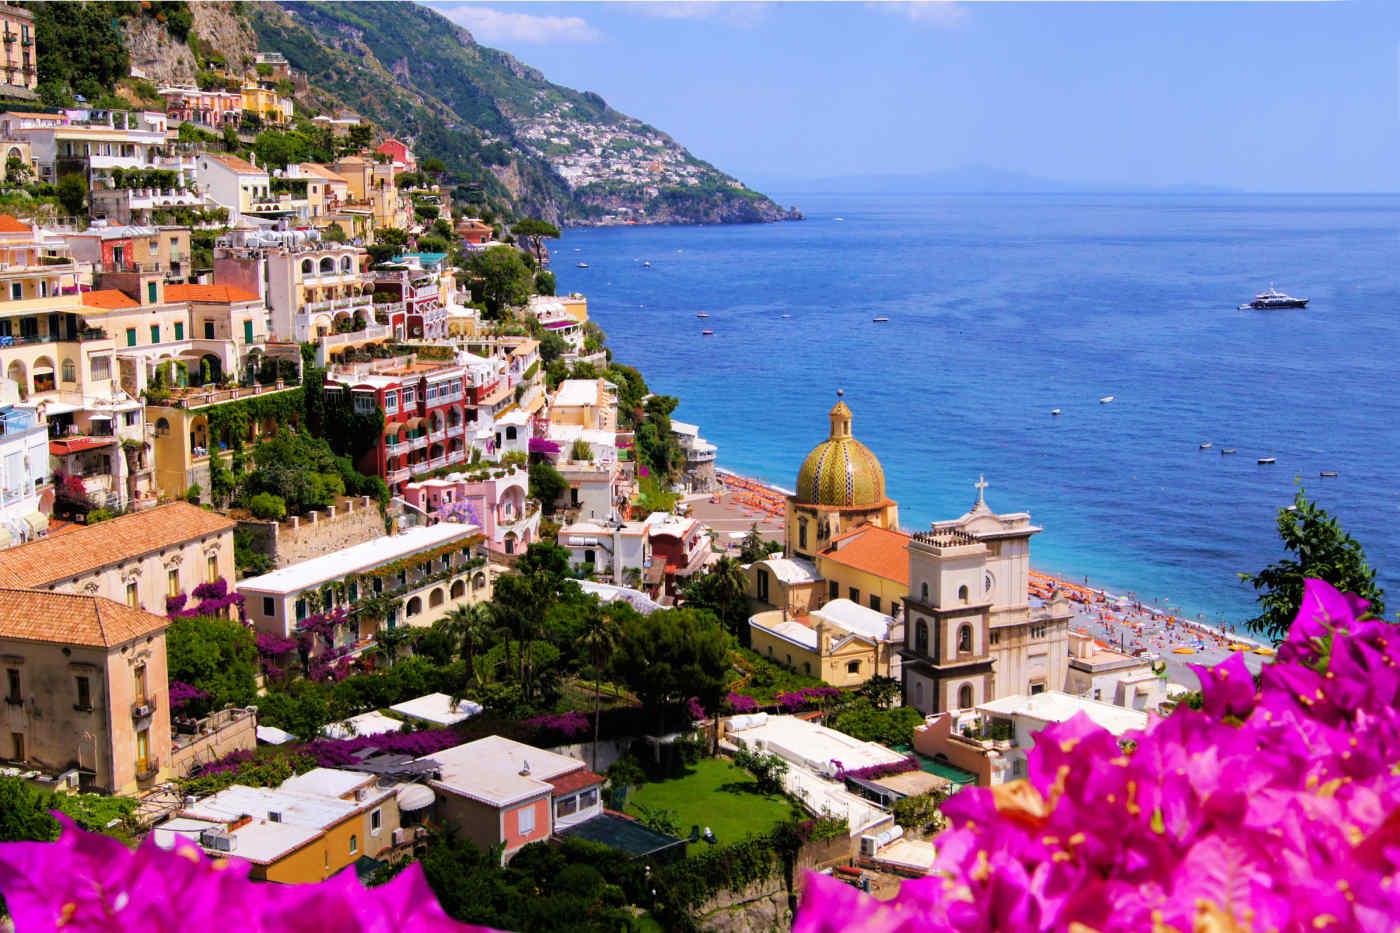 Positano in Italy